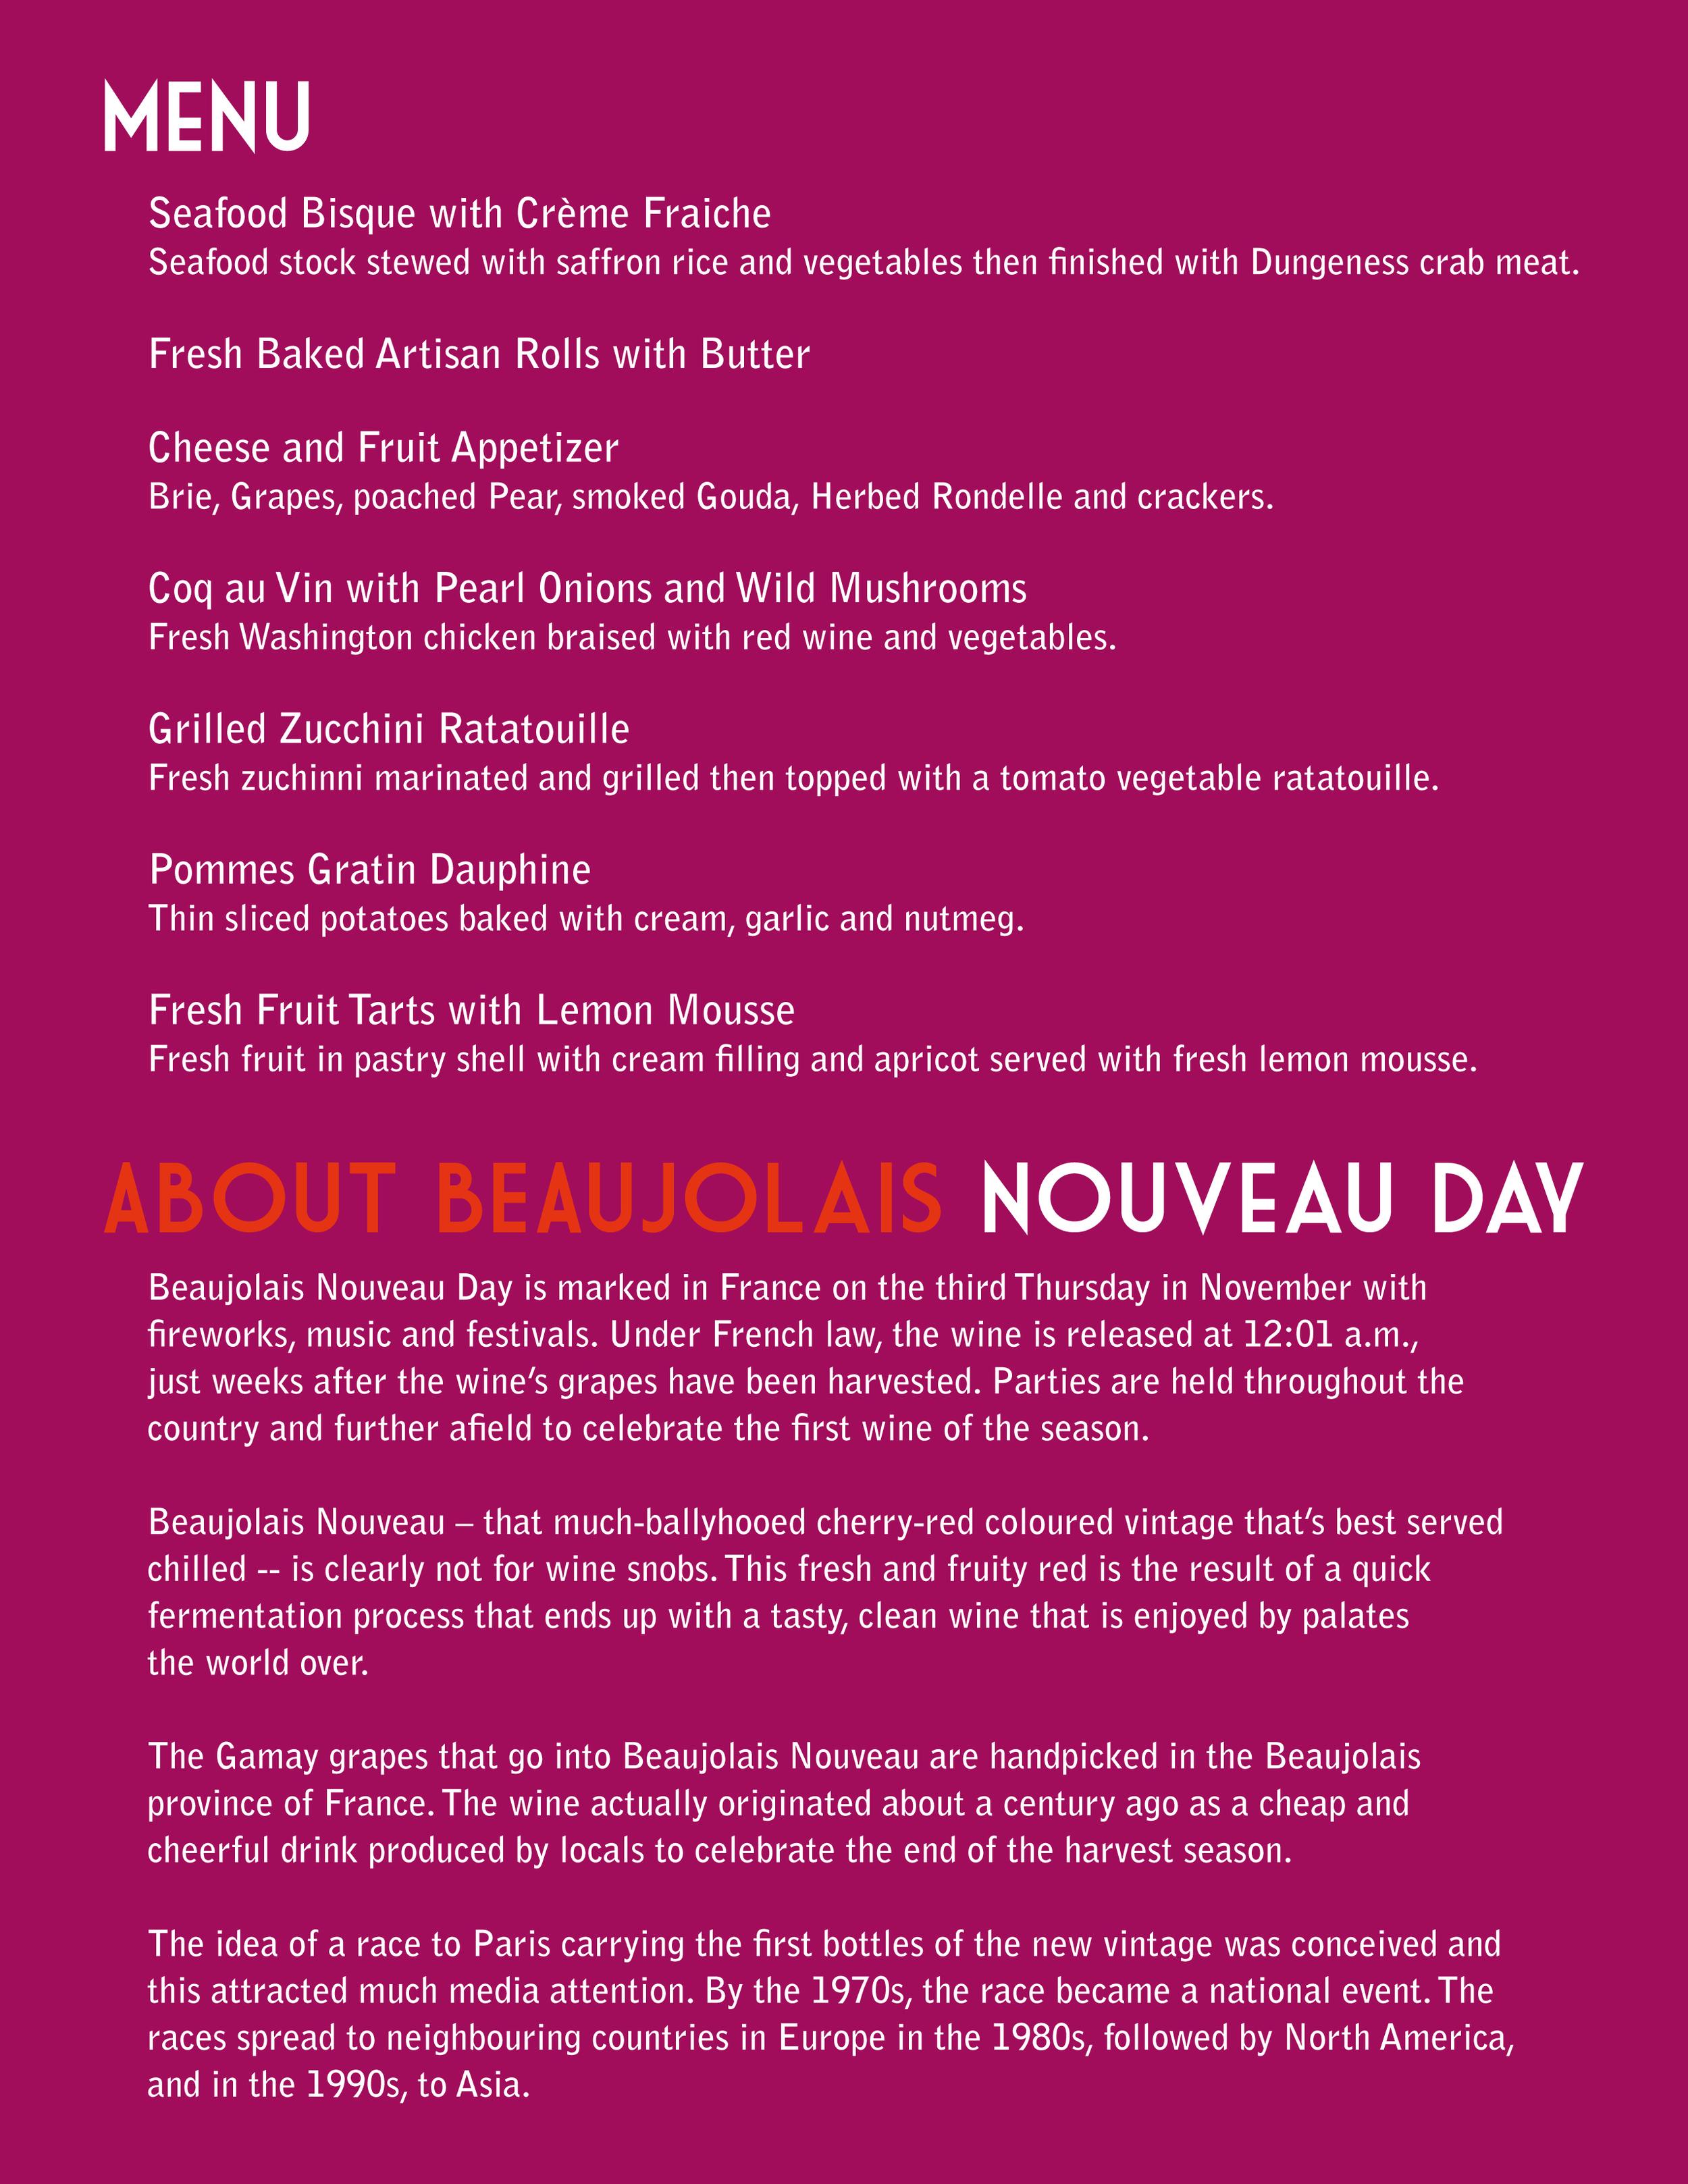 BeaujolaisNouveau2.jpg